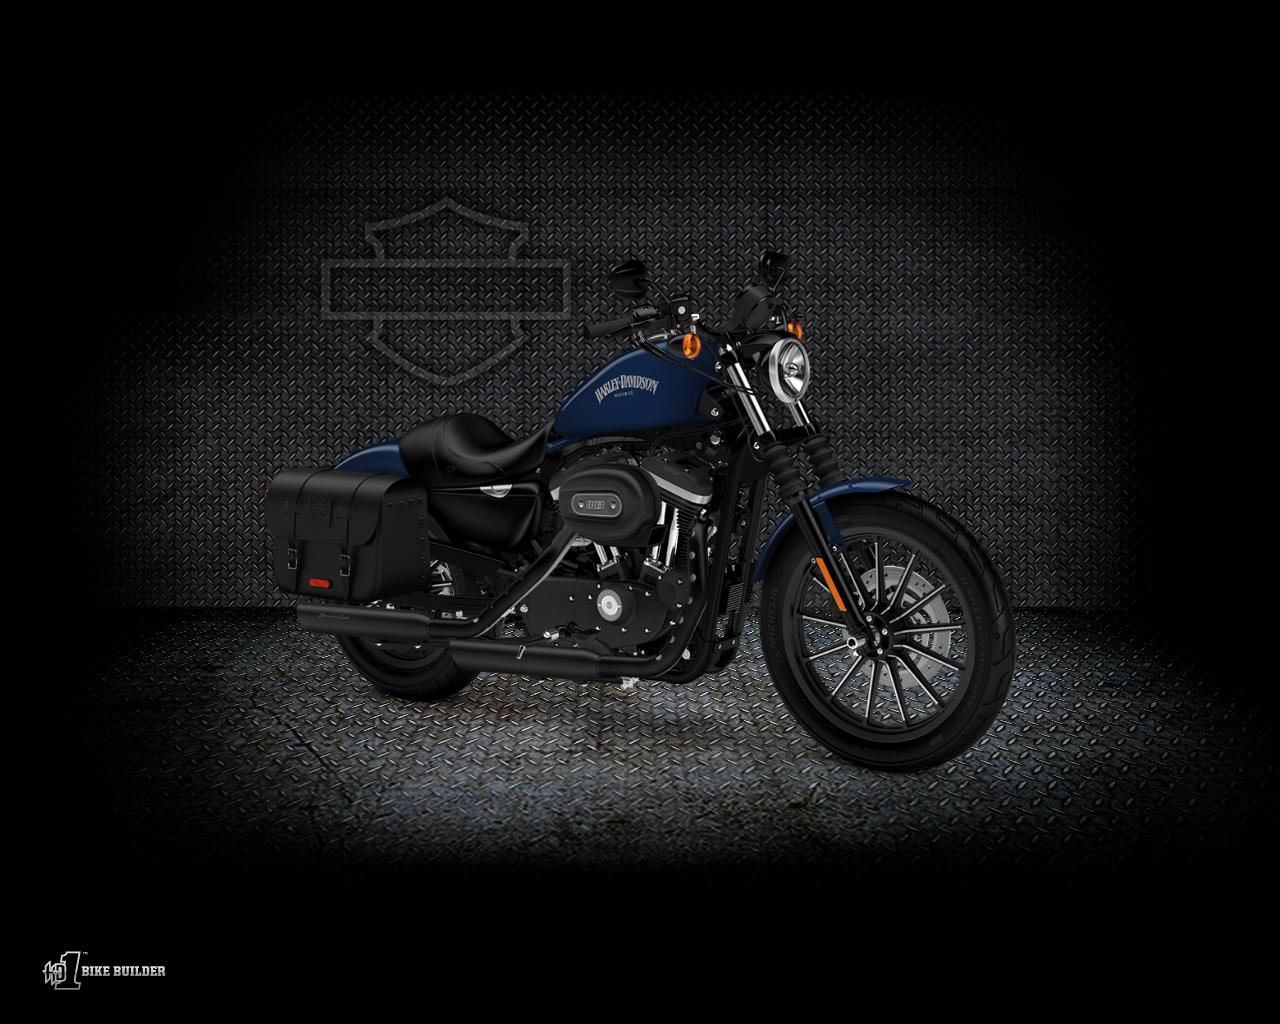 Sportster Iron 883 2012 2013 Harley Davidson Wallpaper 1280x1024